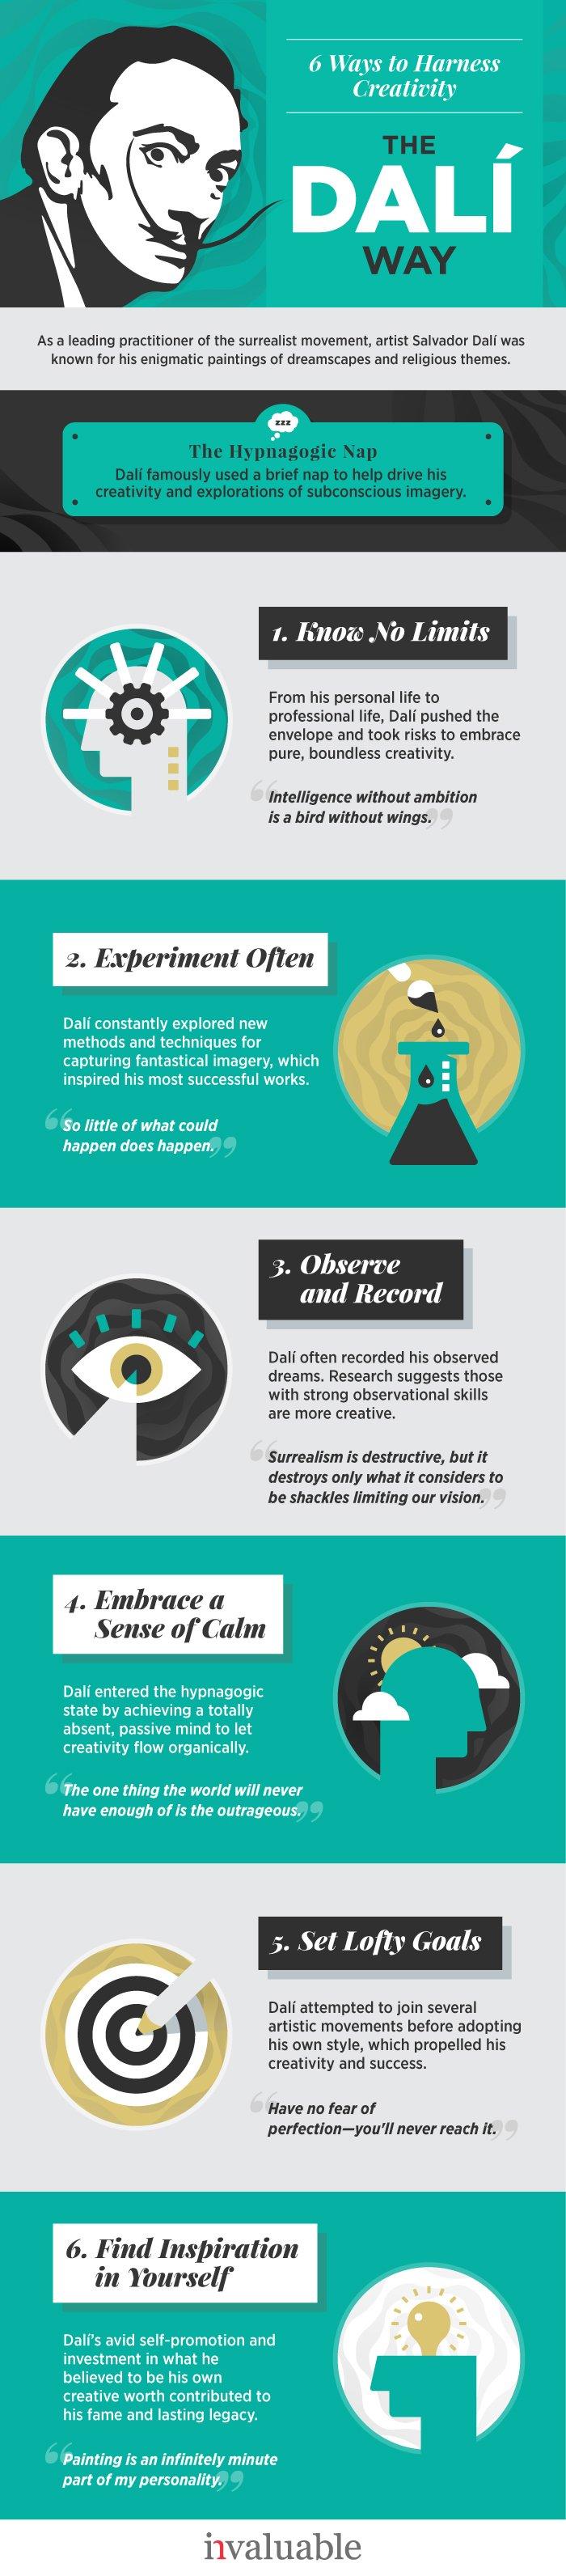 6 ways to harness creativity - the dali way